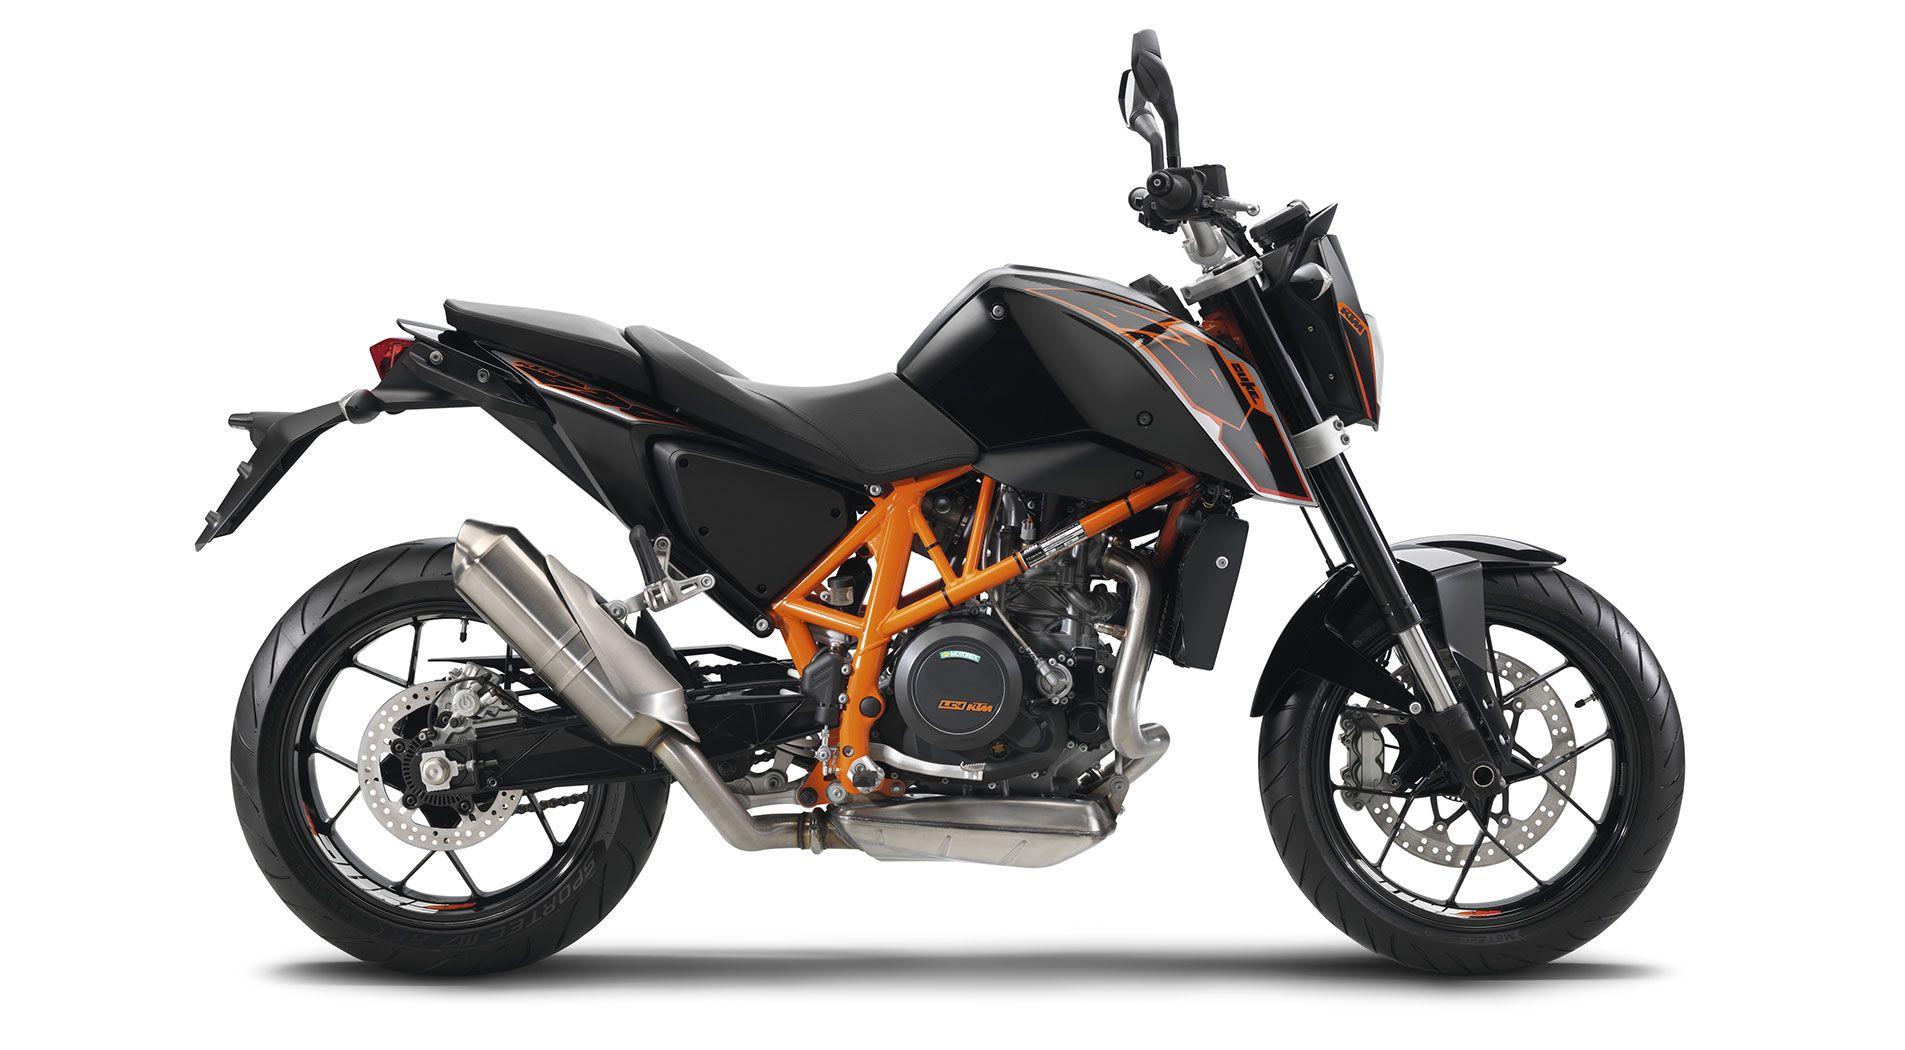 KTM 690 Duke ABS 2015 The essence of motorcycling Ktm